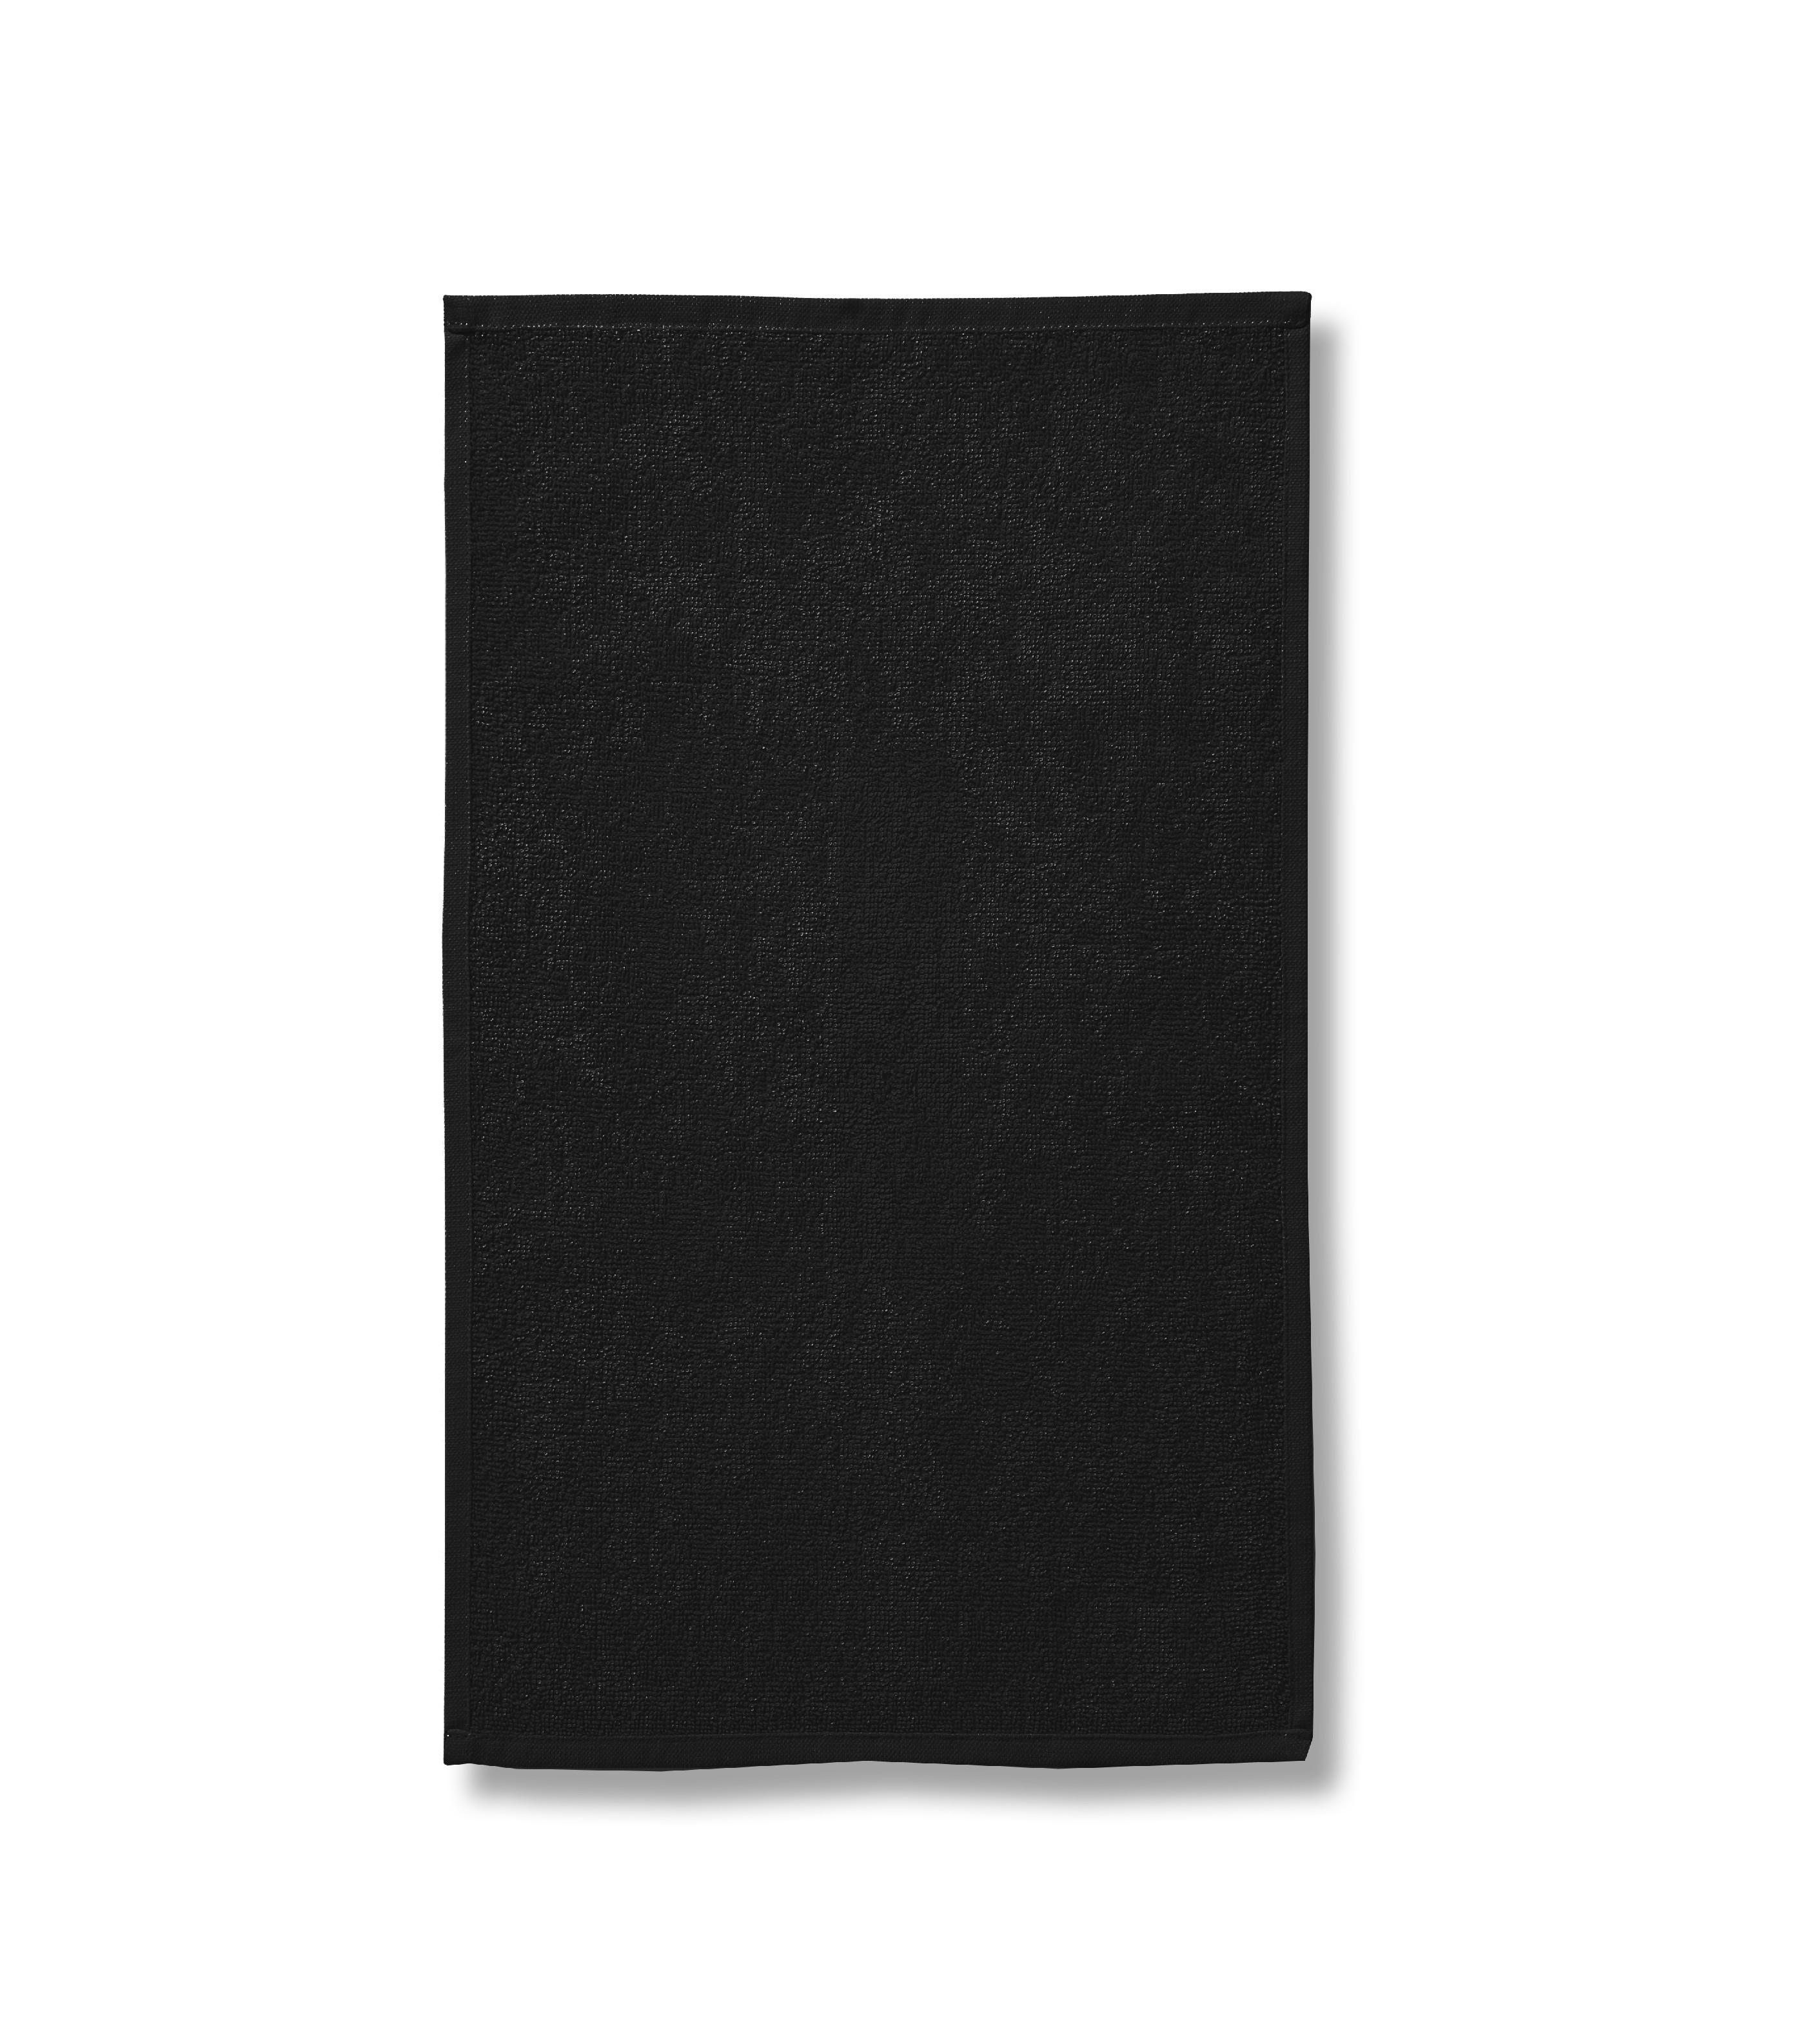 Ručník unisex Terry Towel Barva: černá, Velikost: 50 x 100 cm